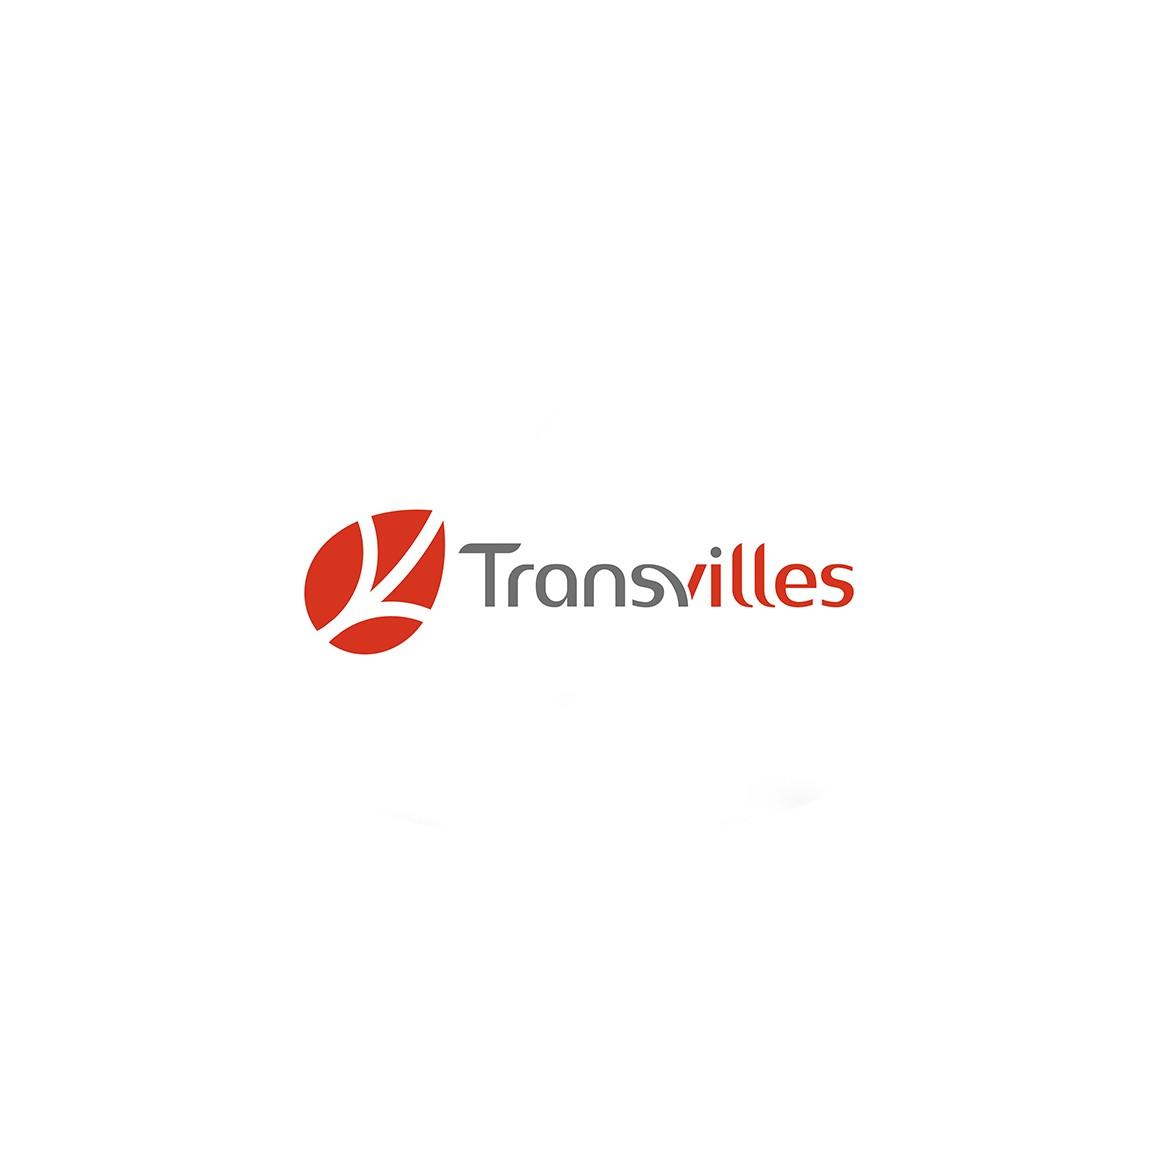 Transvilles